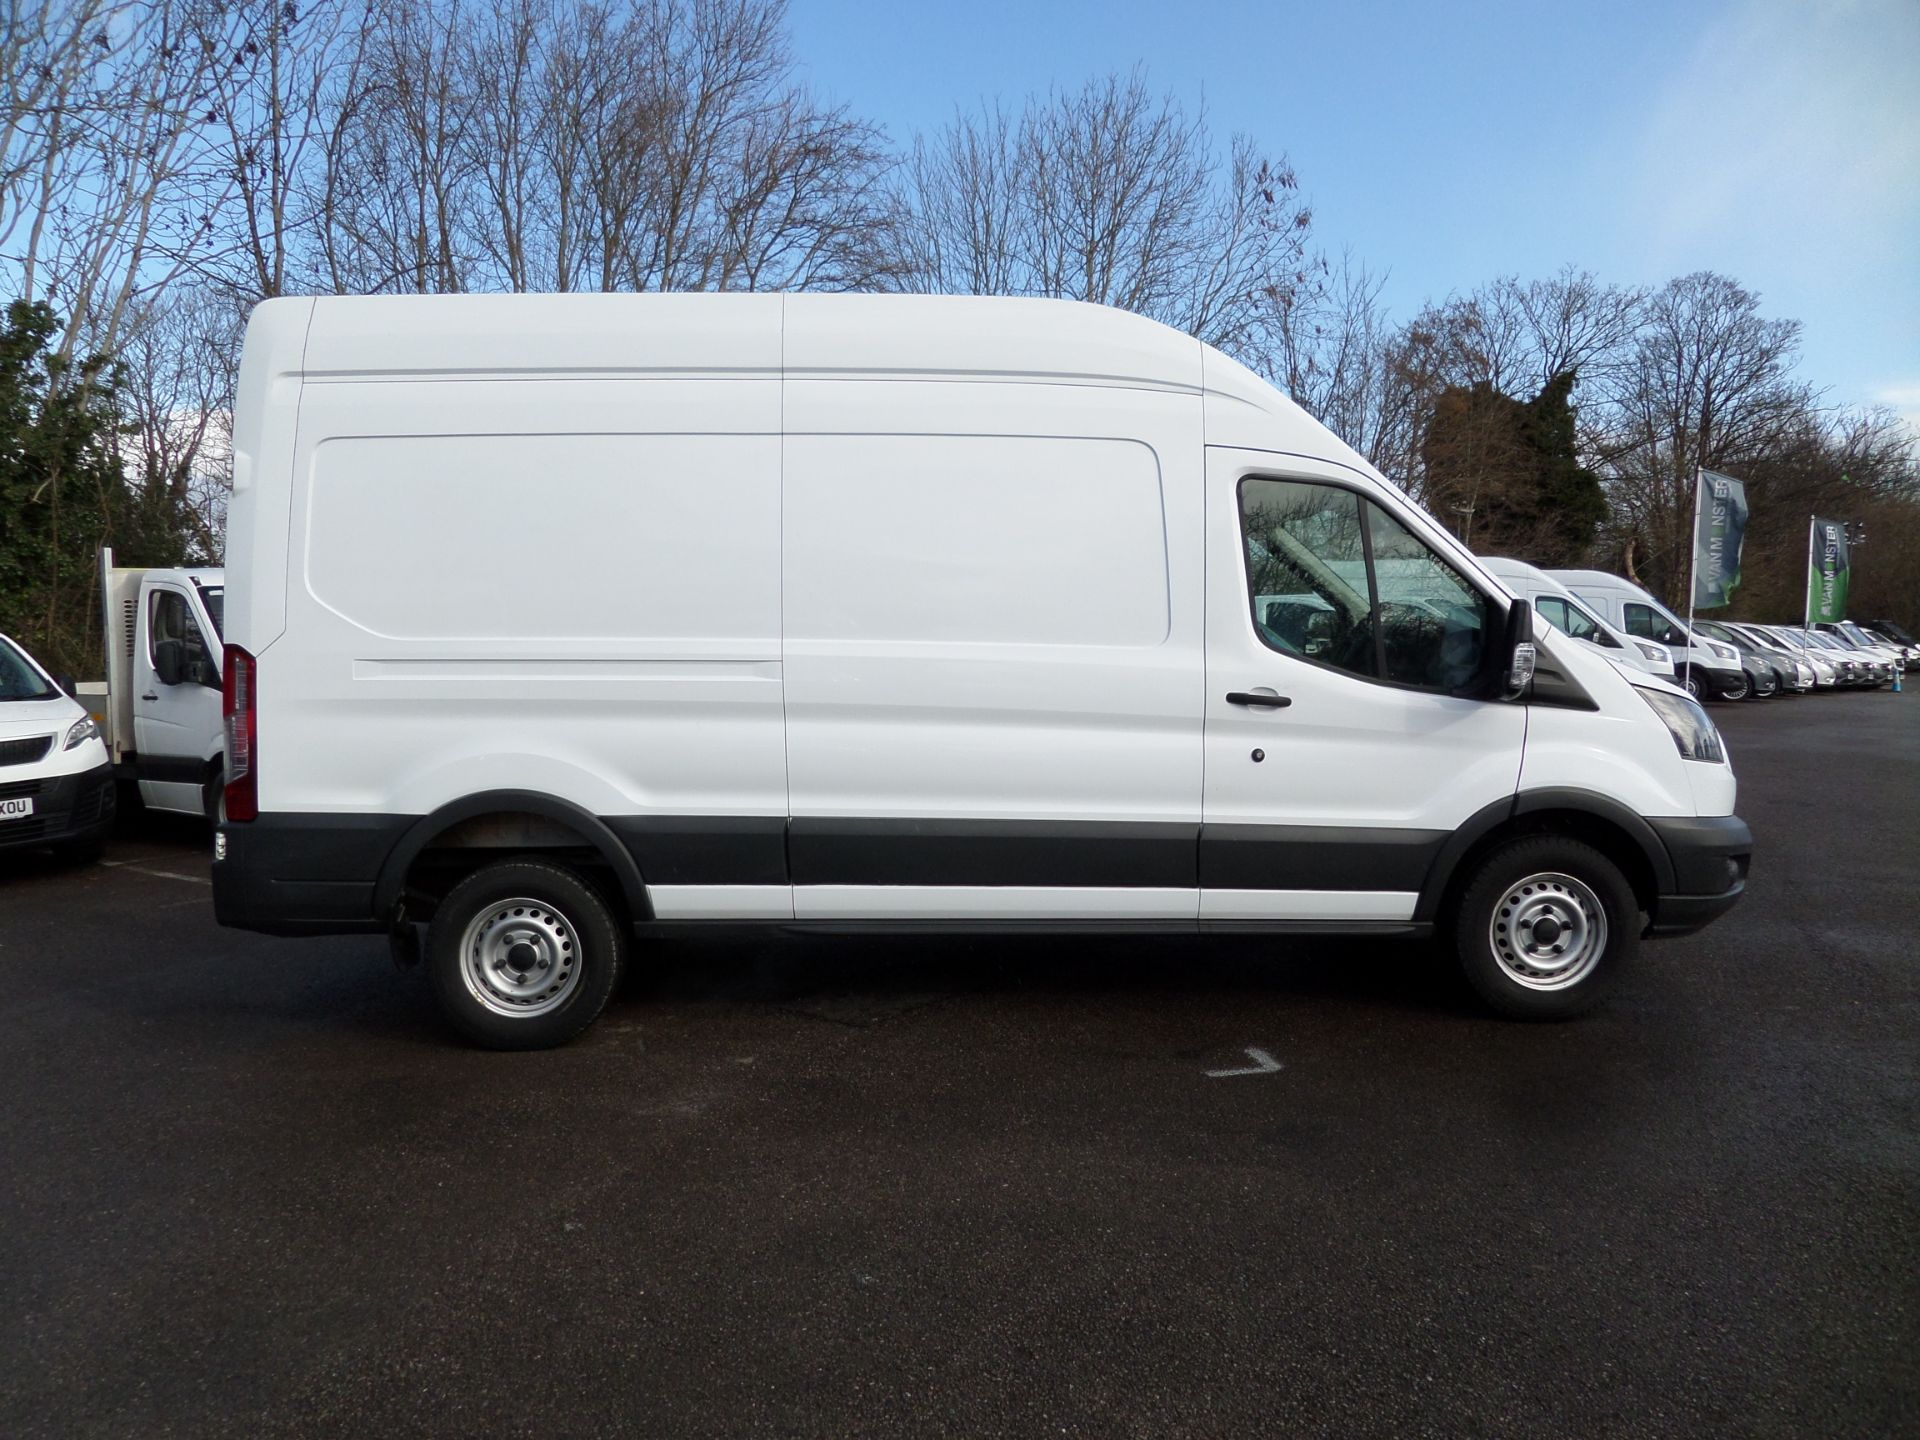 2018 Ford Transit 2.0 Tdci 130Ps H3 Van Euro 6 (WV18JXH) Image 2